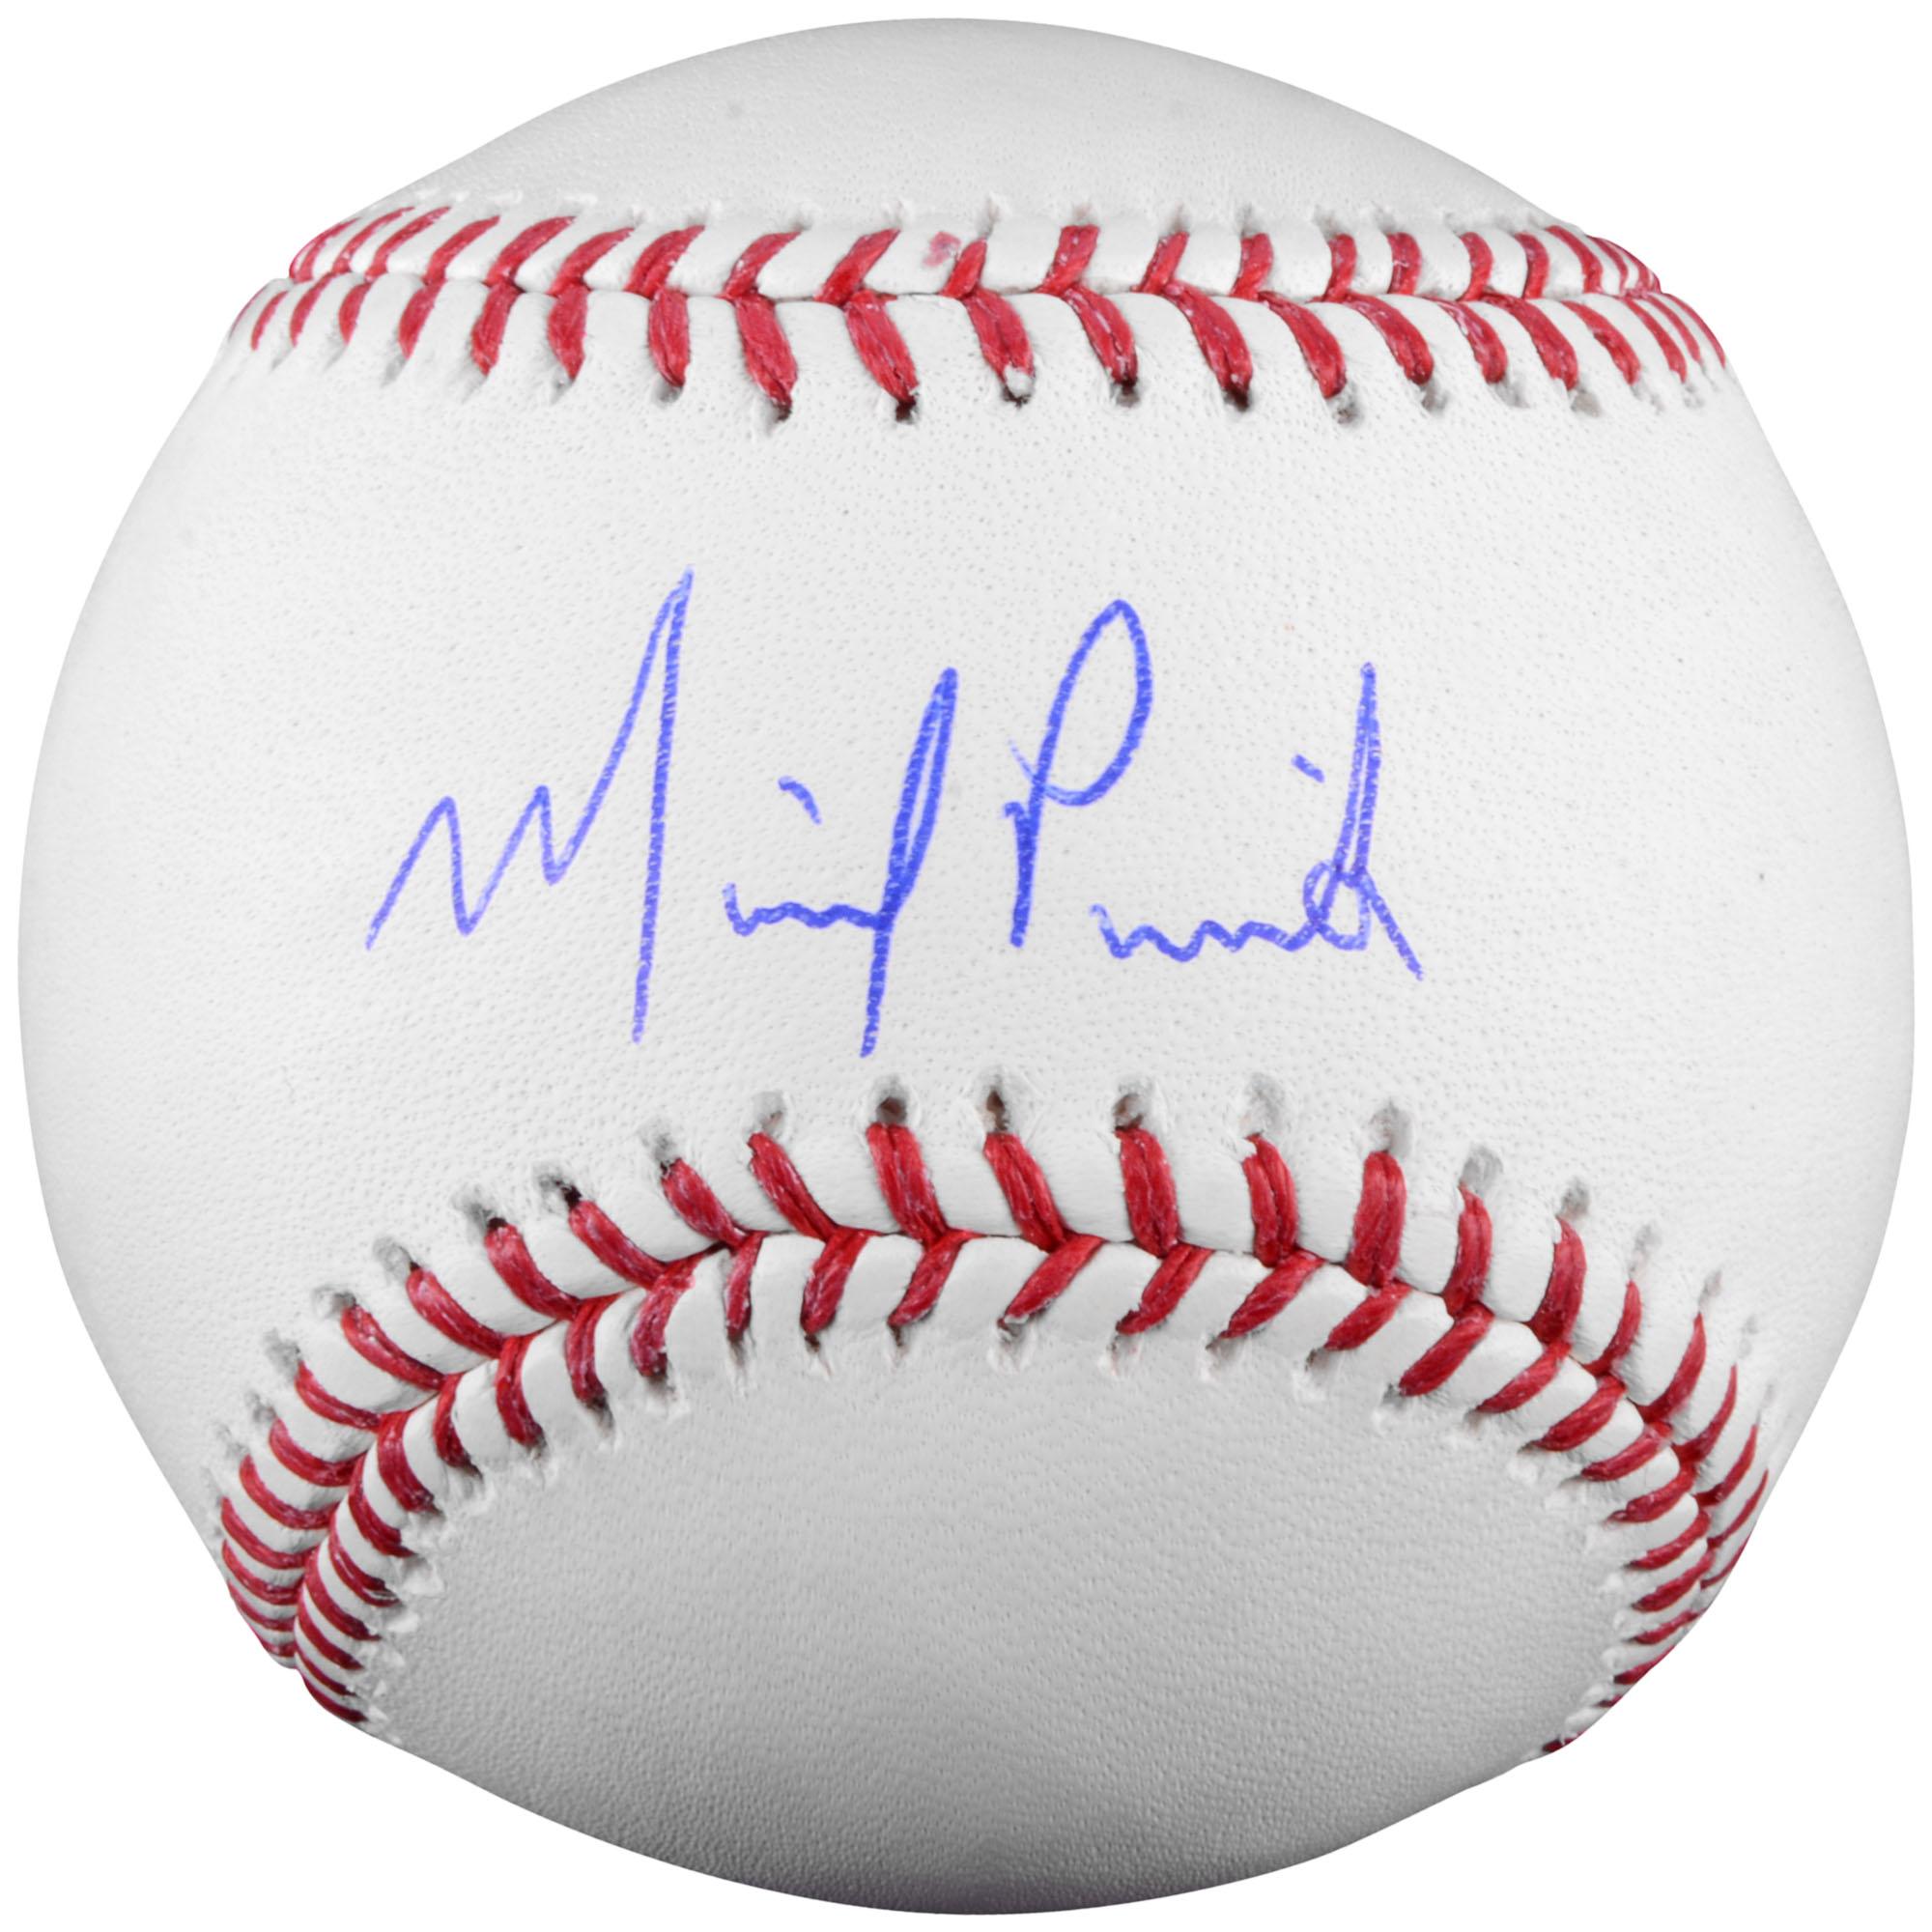 Michael Pineda Minnesota Twins Fanatics Authentic Autographed Baseball - No Size